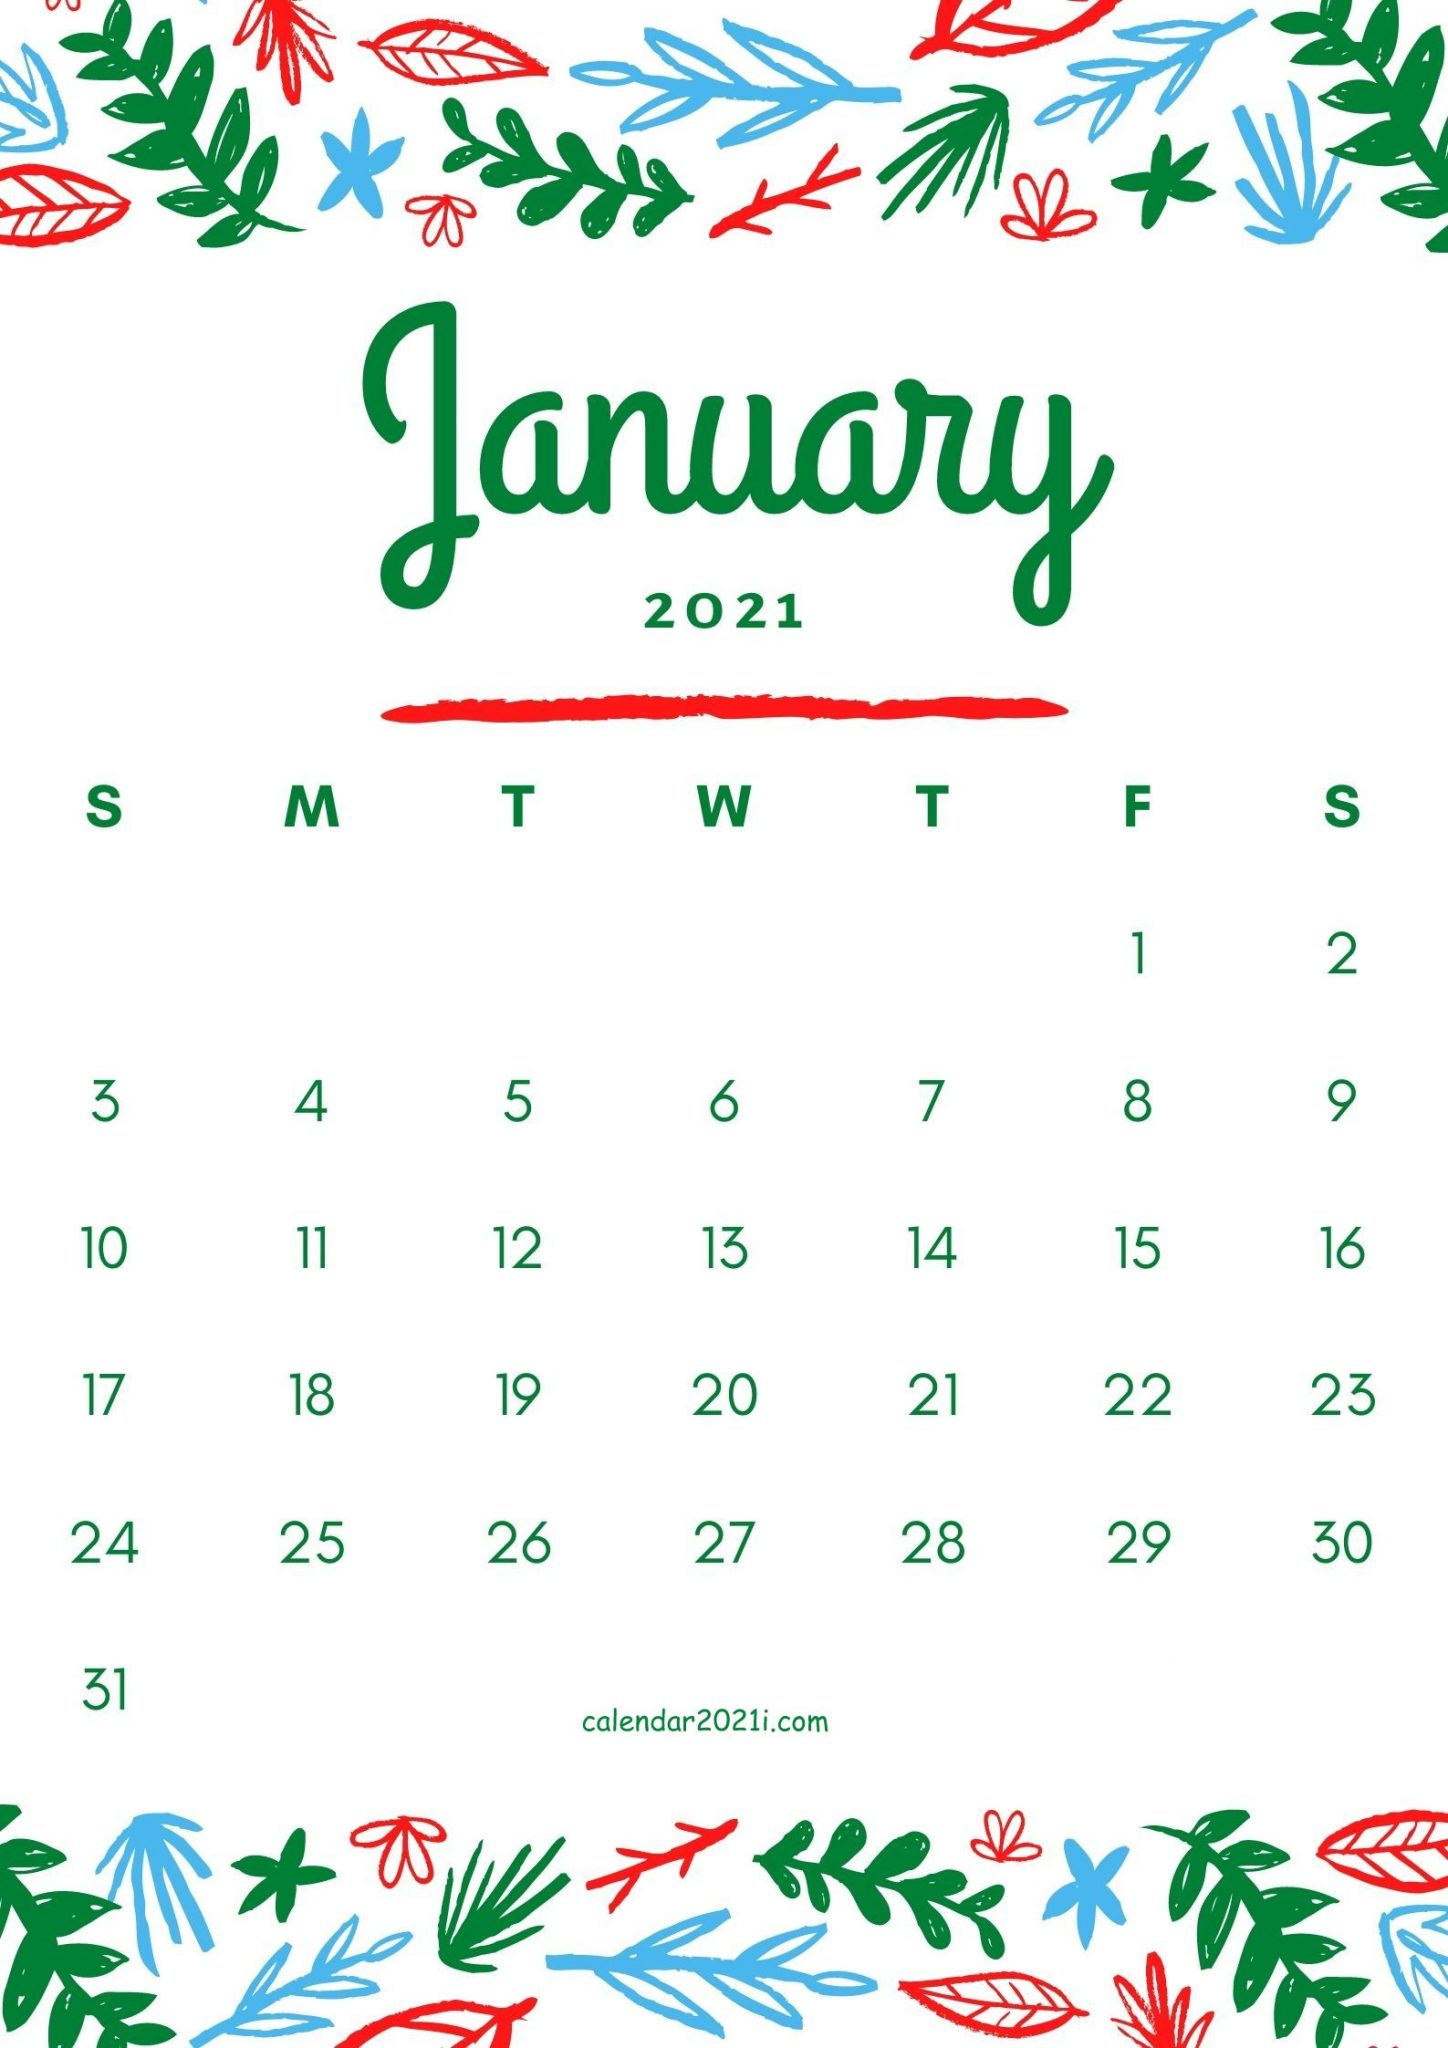 January 2021 Flower Calendar